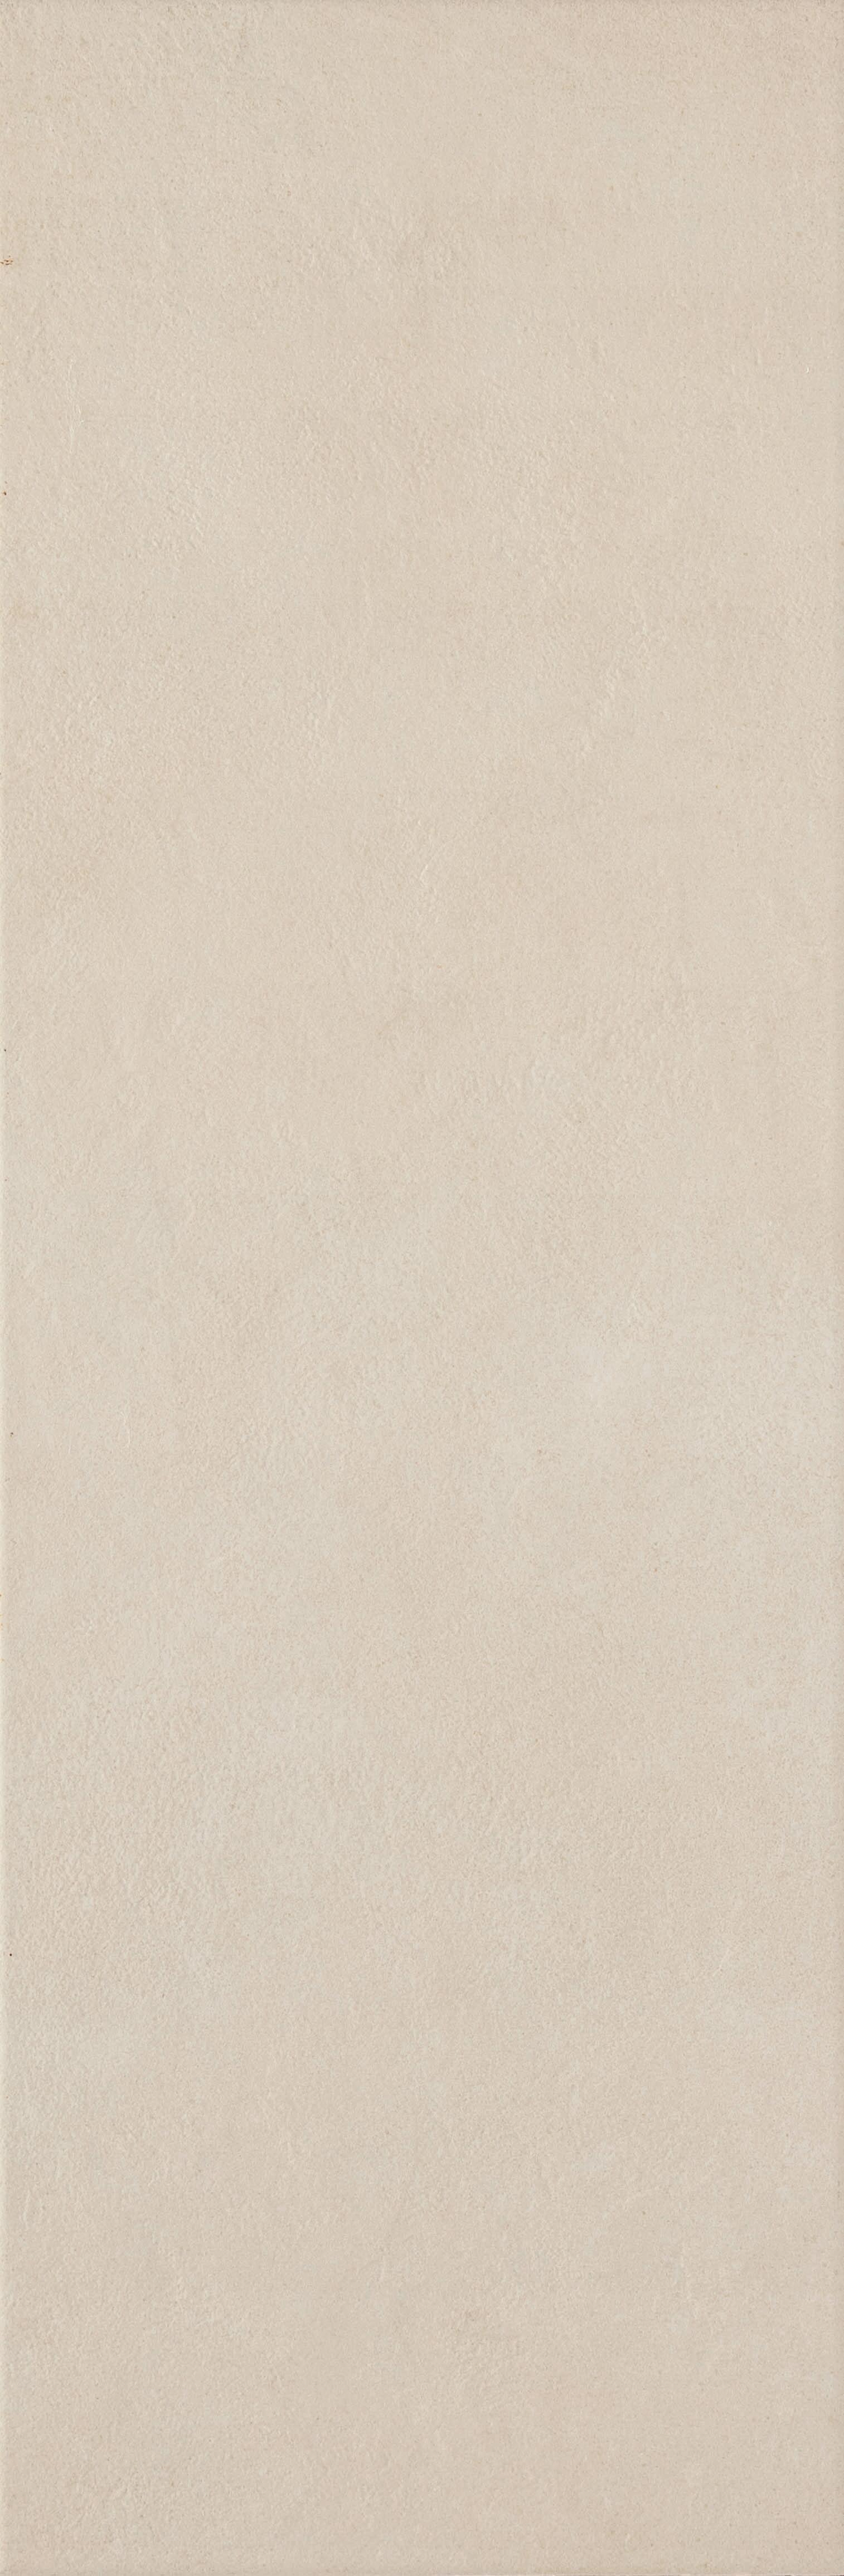 Piastrella per rivestimenti Atelier 25 x 76 cm sp. 10 mm beige - 4